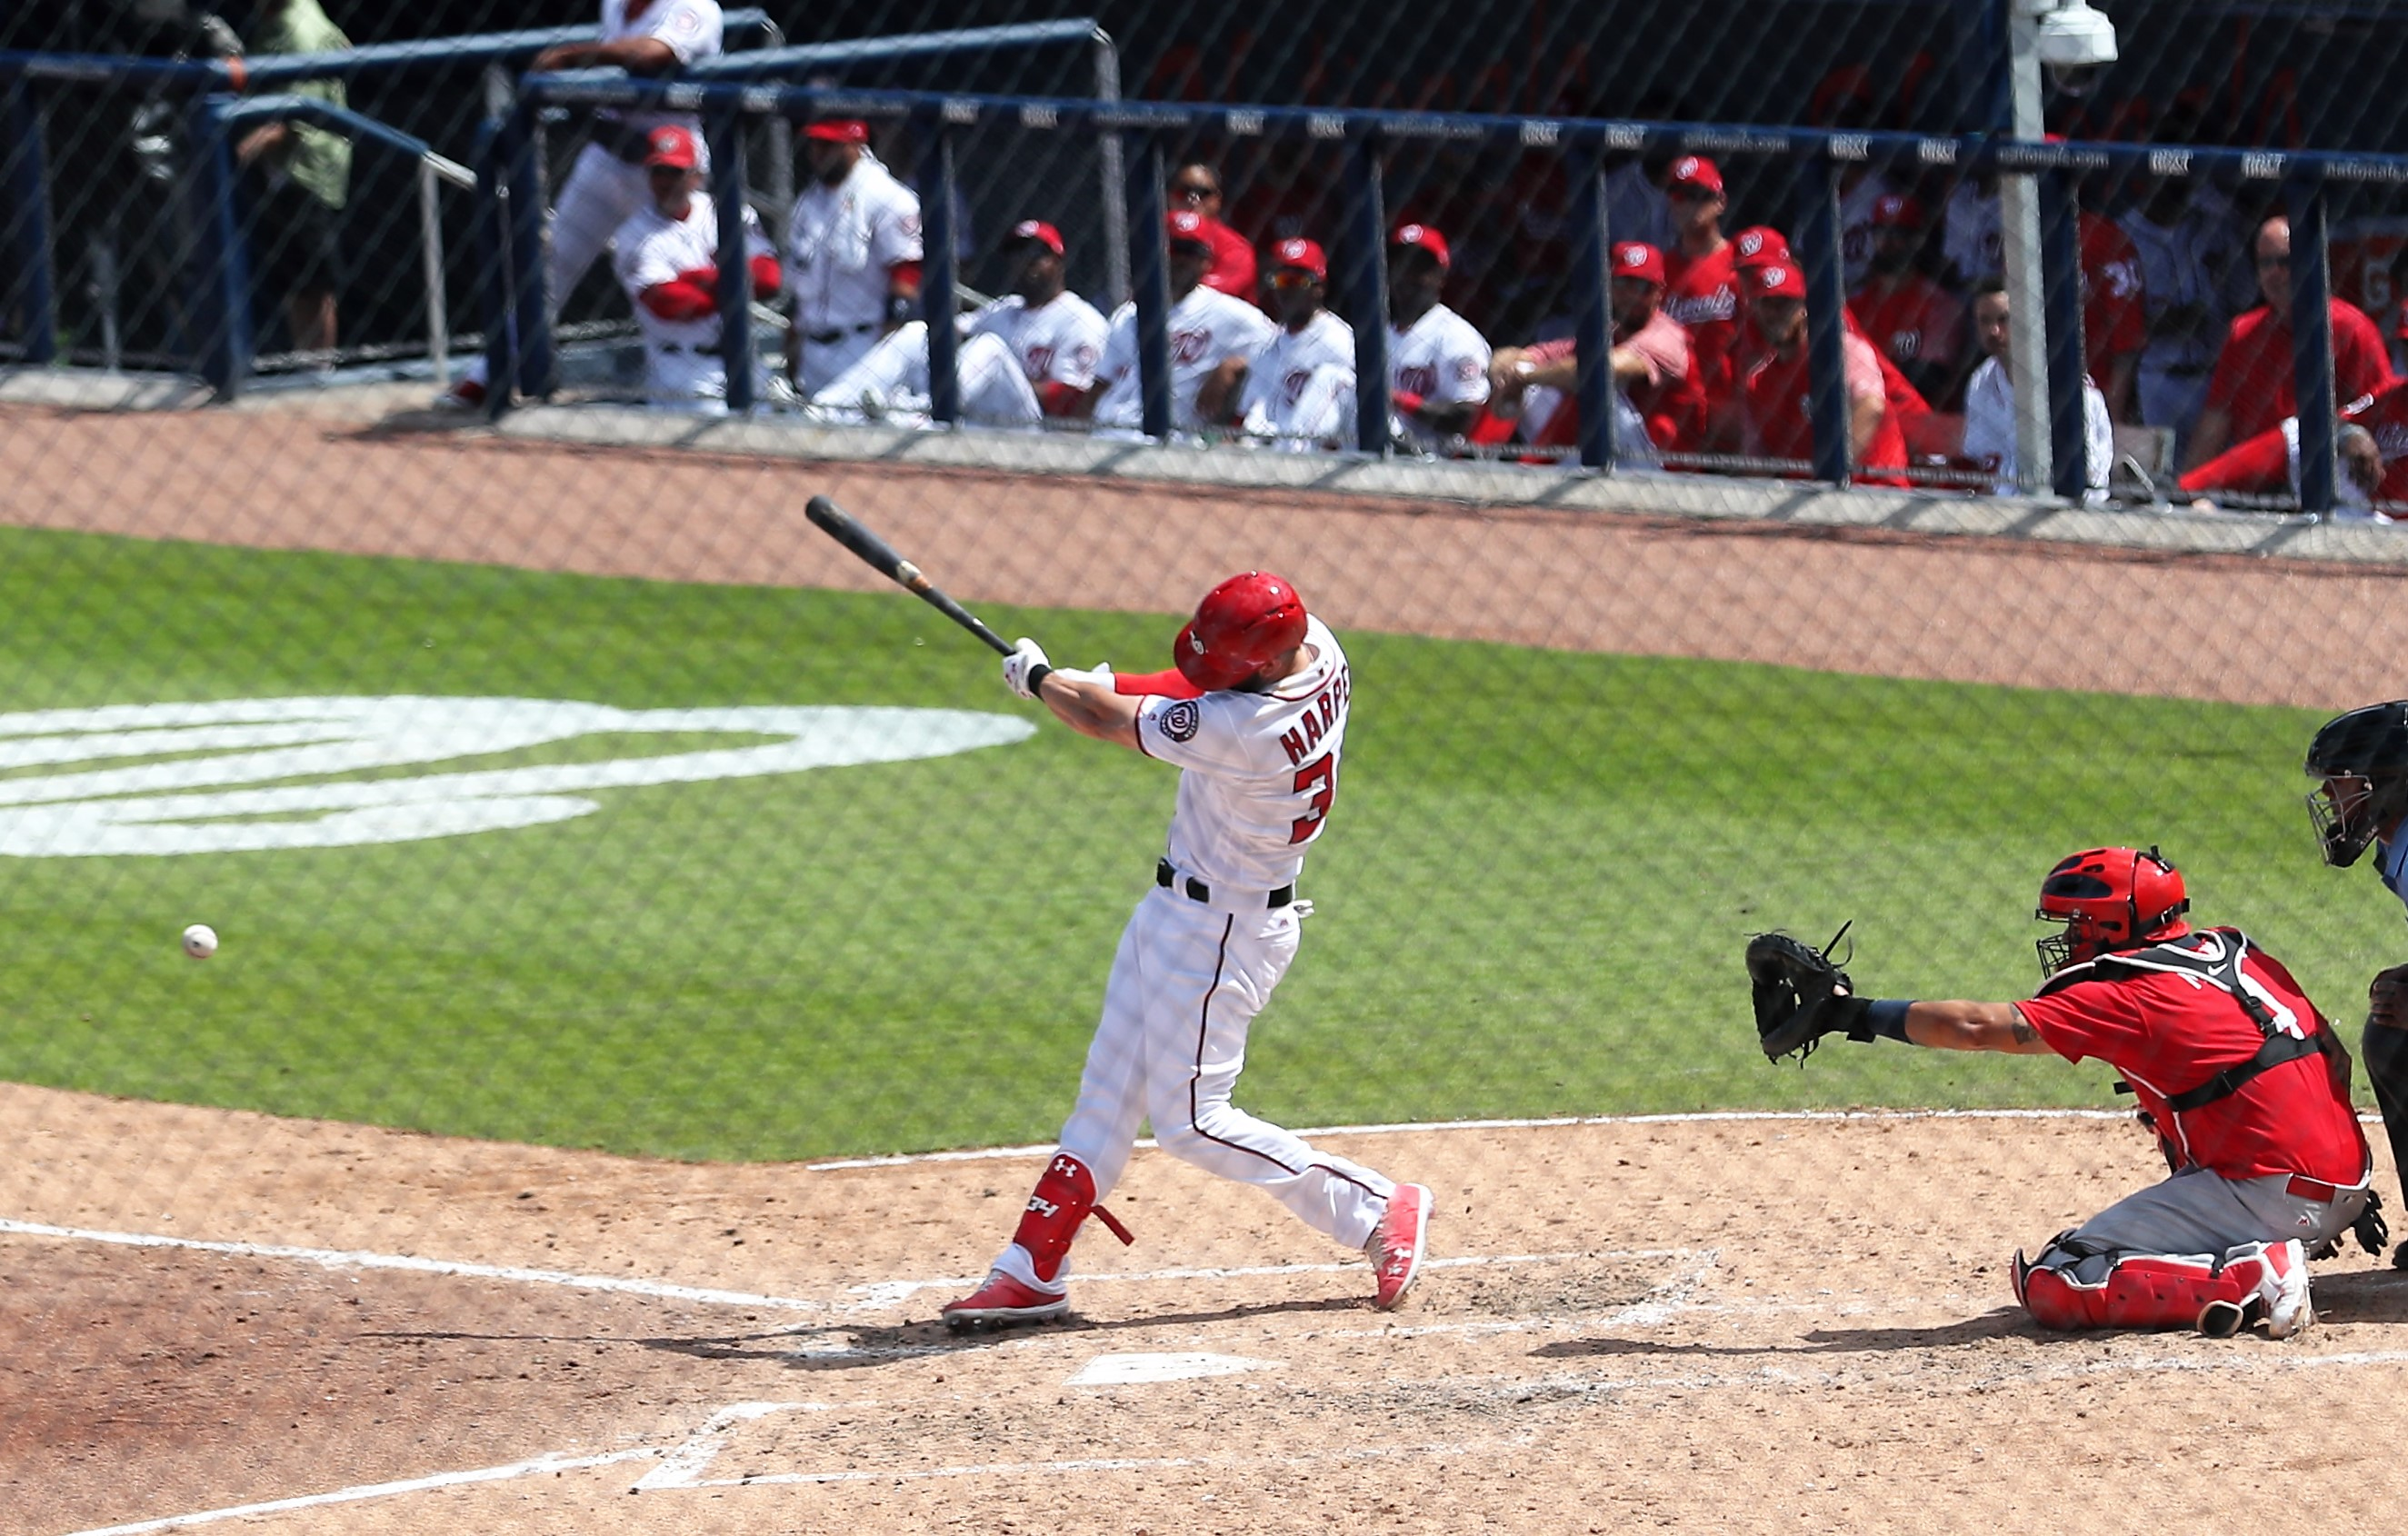 Sol-tucker-bryce-harper-batting-chandler-bat